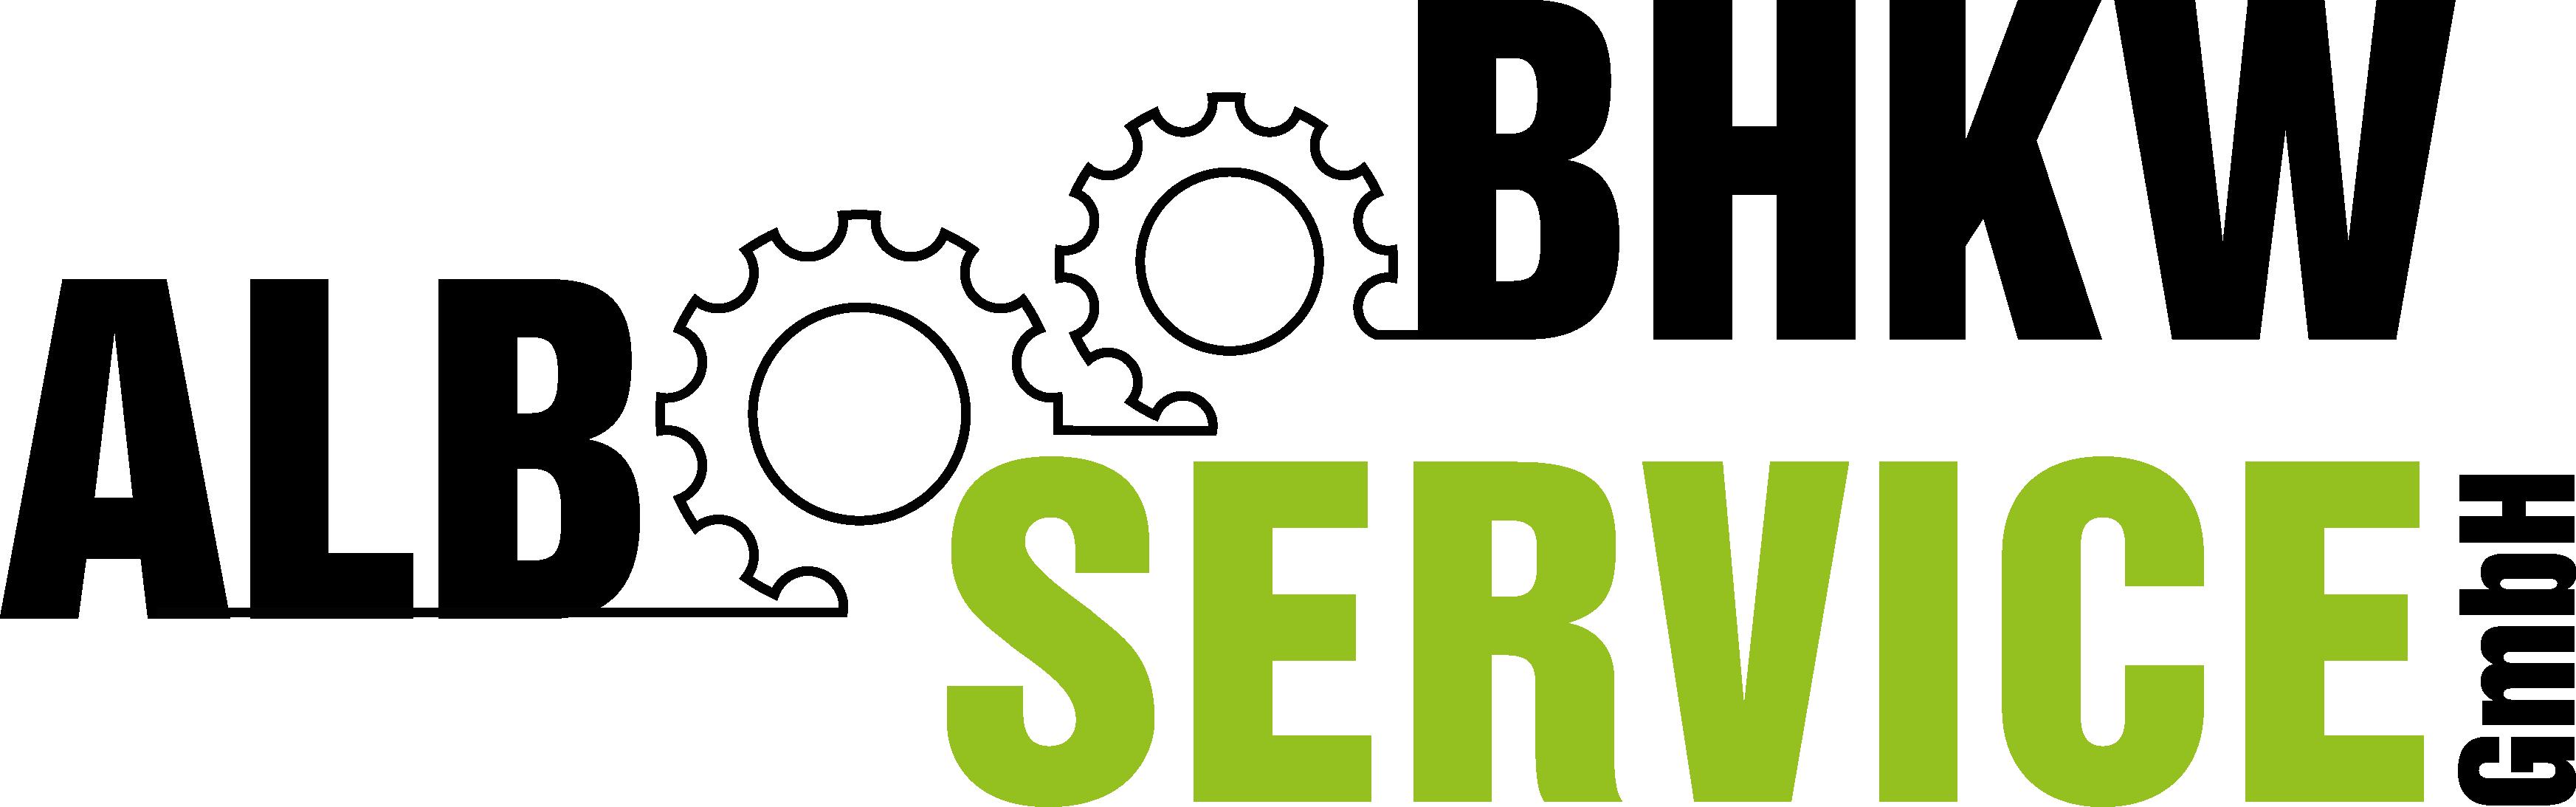 Alb BHKW Service GmbH